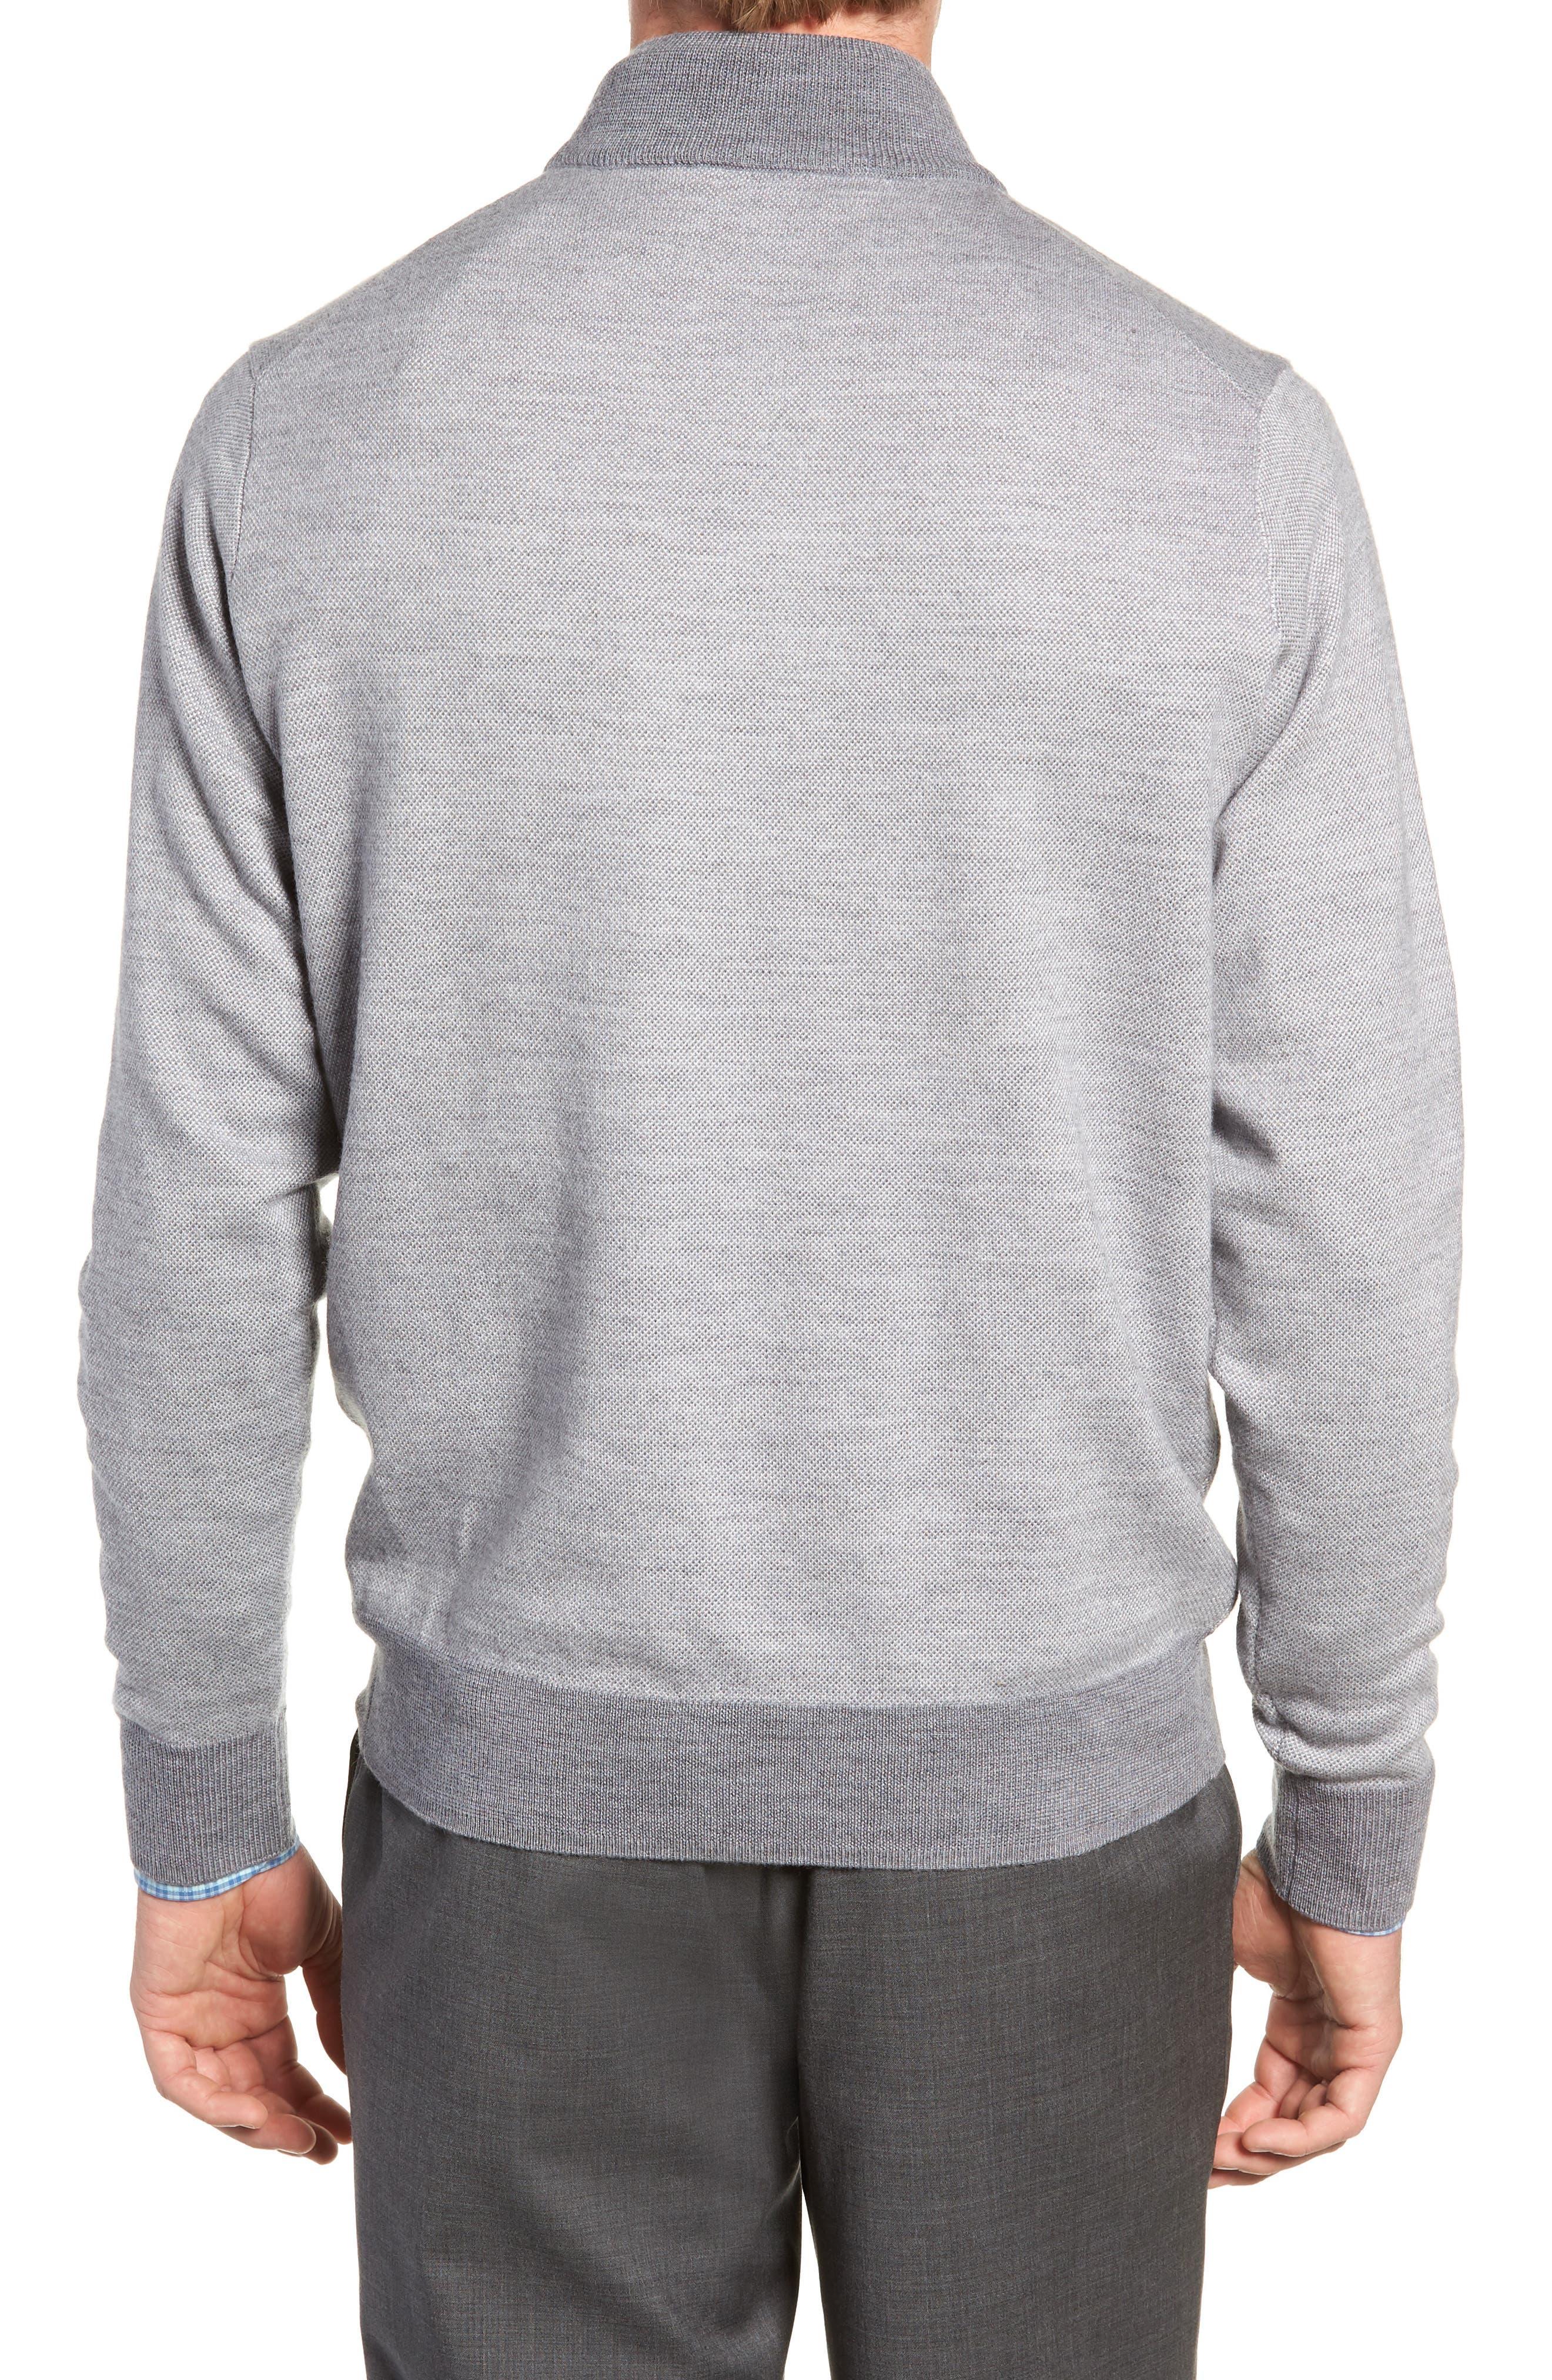 Birdseye Merino Wool Quarter Zip Sweater,                             Alternate thumbnail 2, color,                             BRITISH GREY